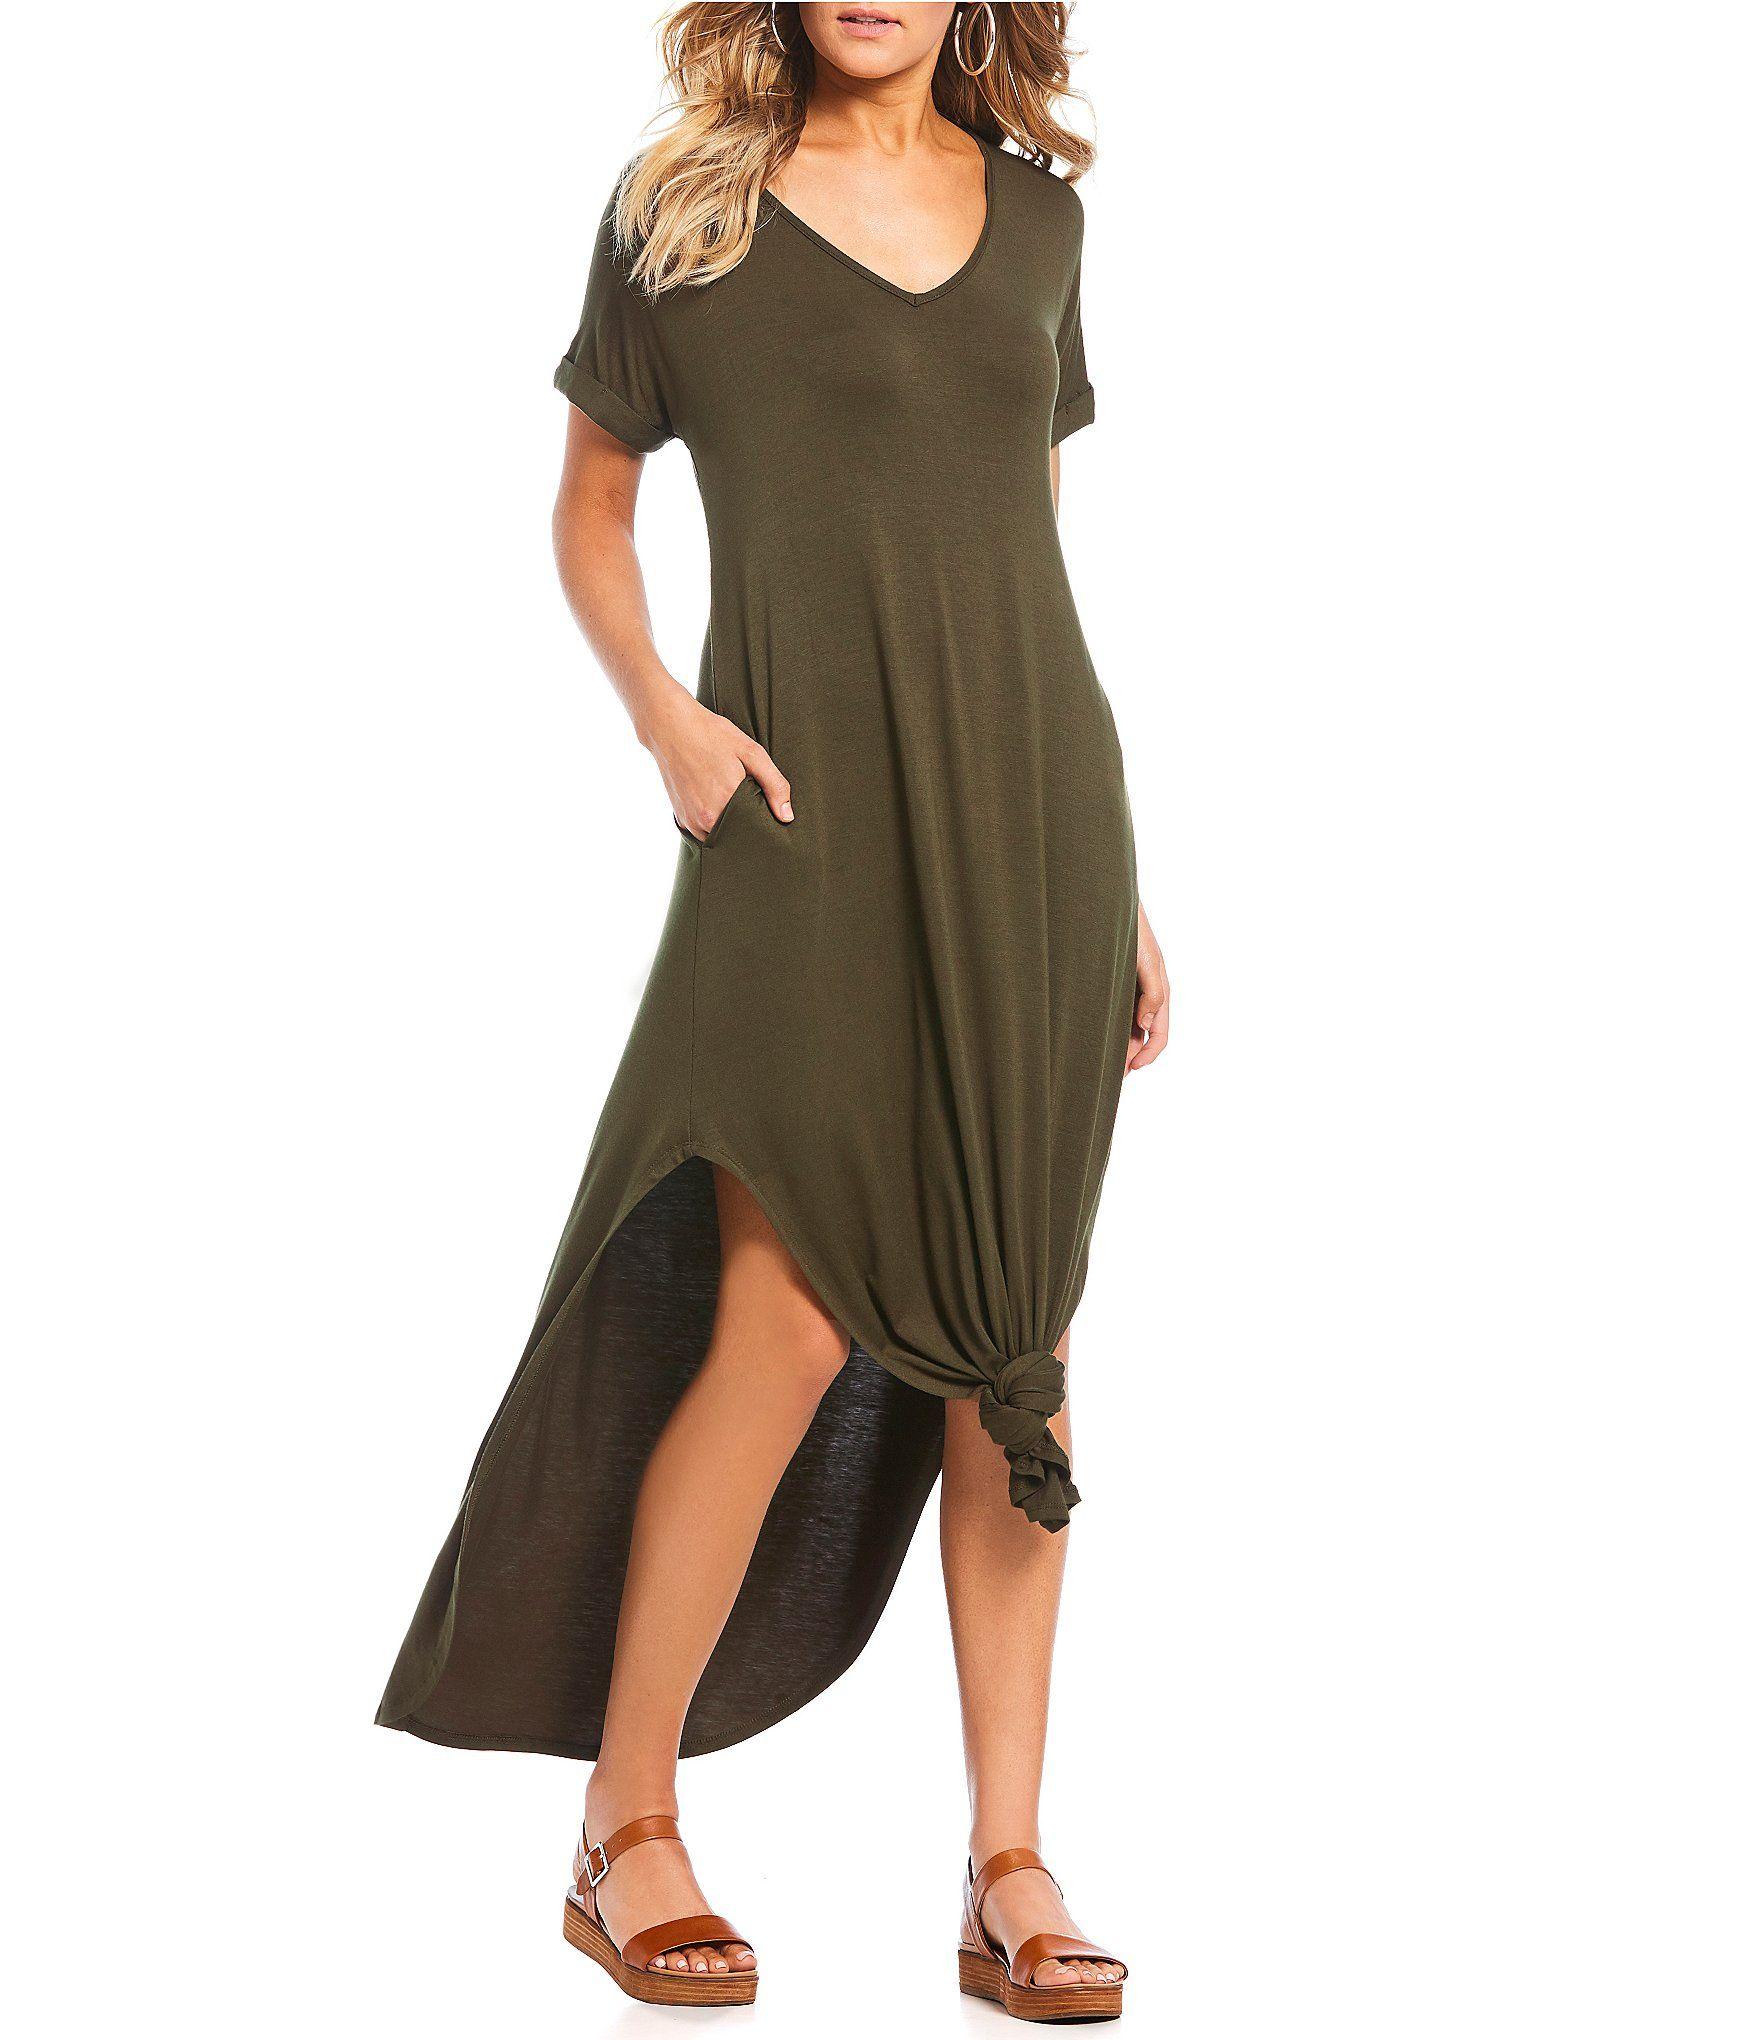 Stilletto's Oversized T-Shirt V-Neck Maxi Dress   Dillard's in ...